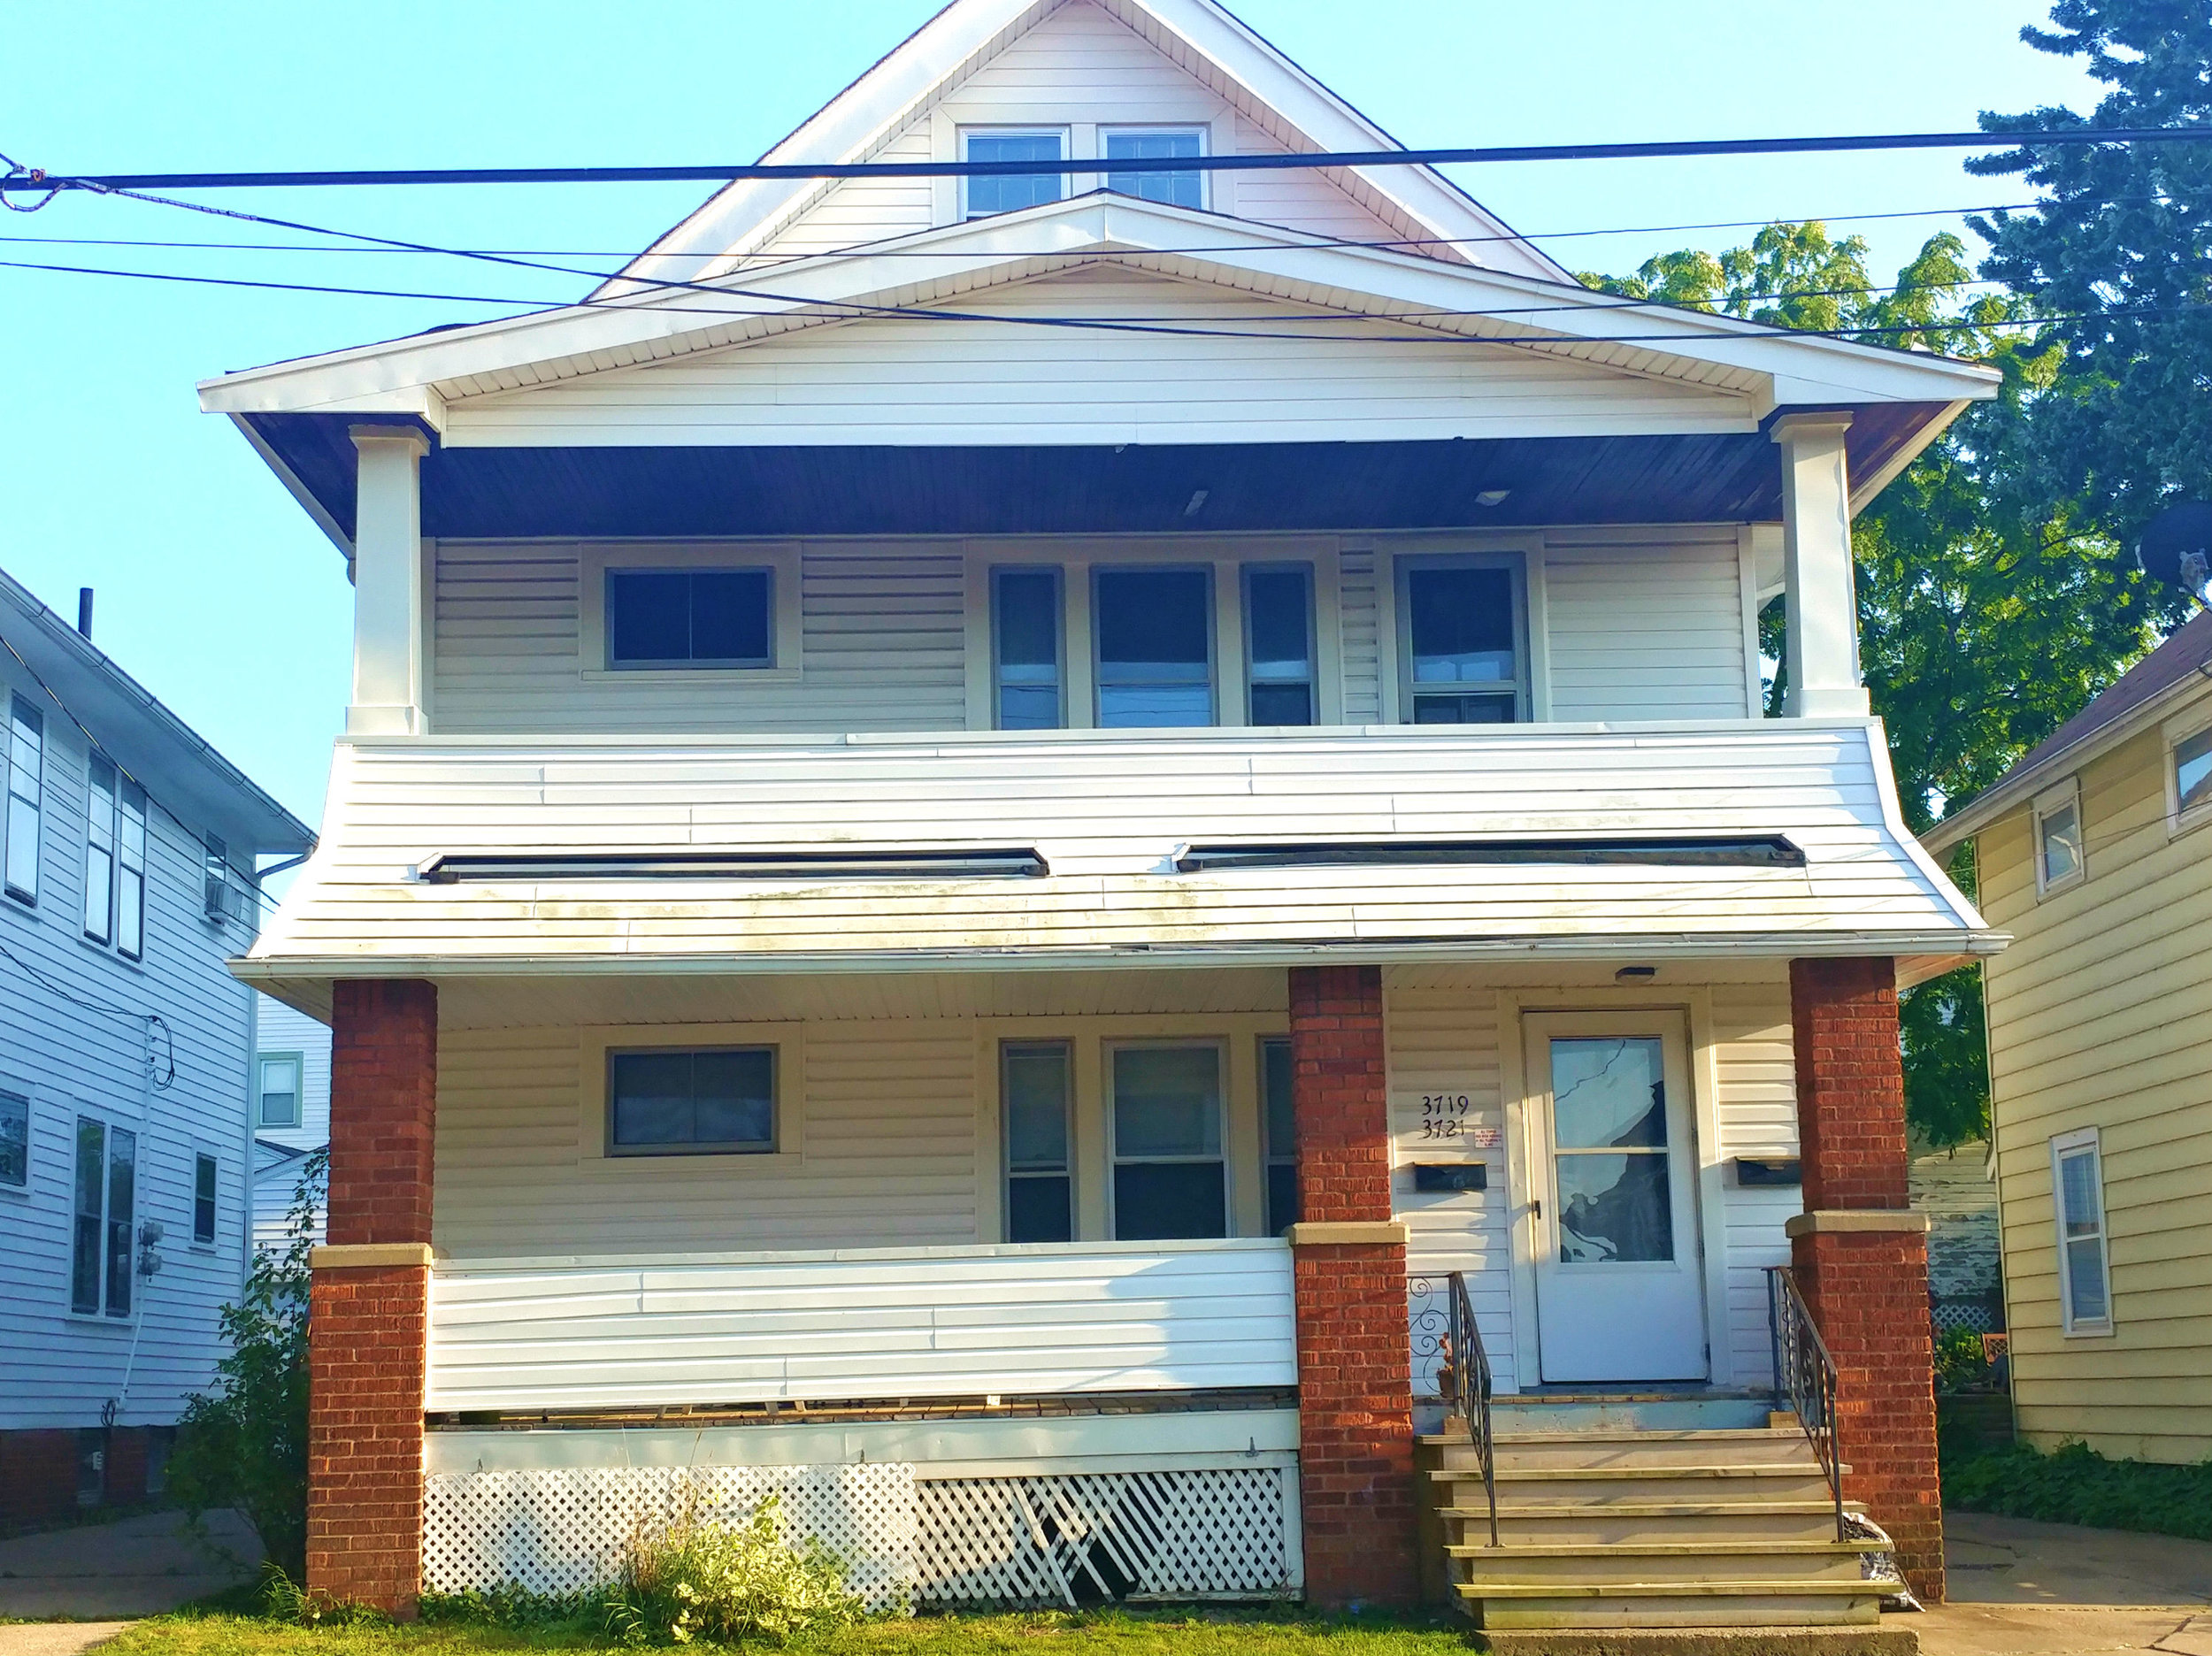 3719 Cecilia Ave., Cleveland | 4 bed 2 bath | 1,904 Sq. Ft. | $82,500